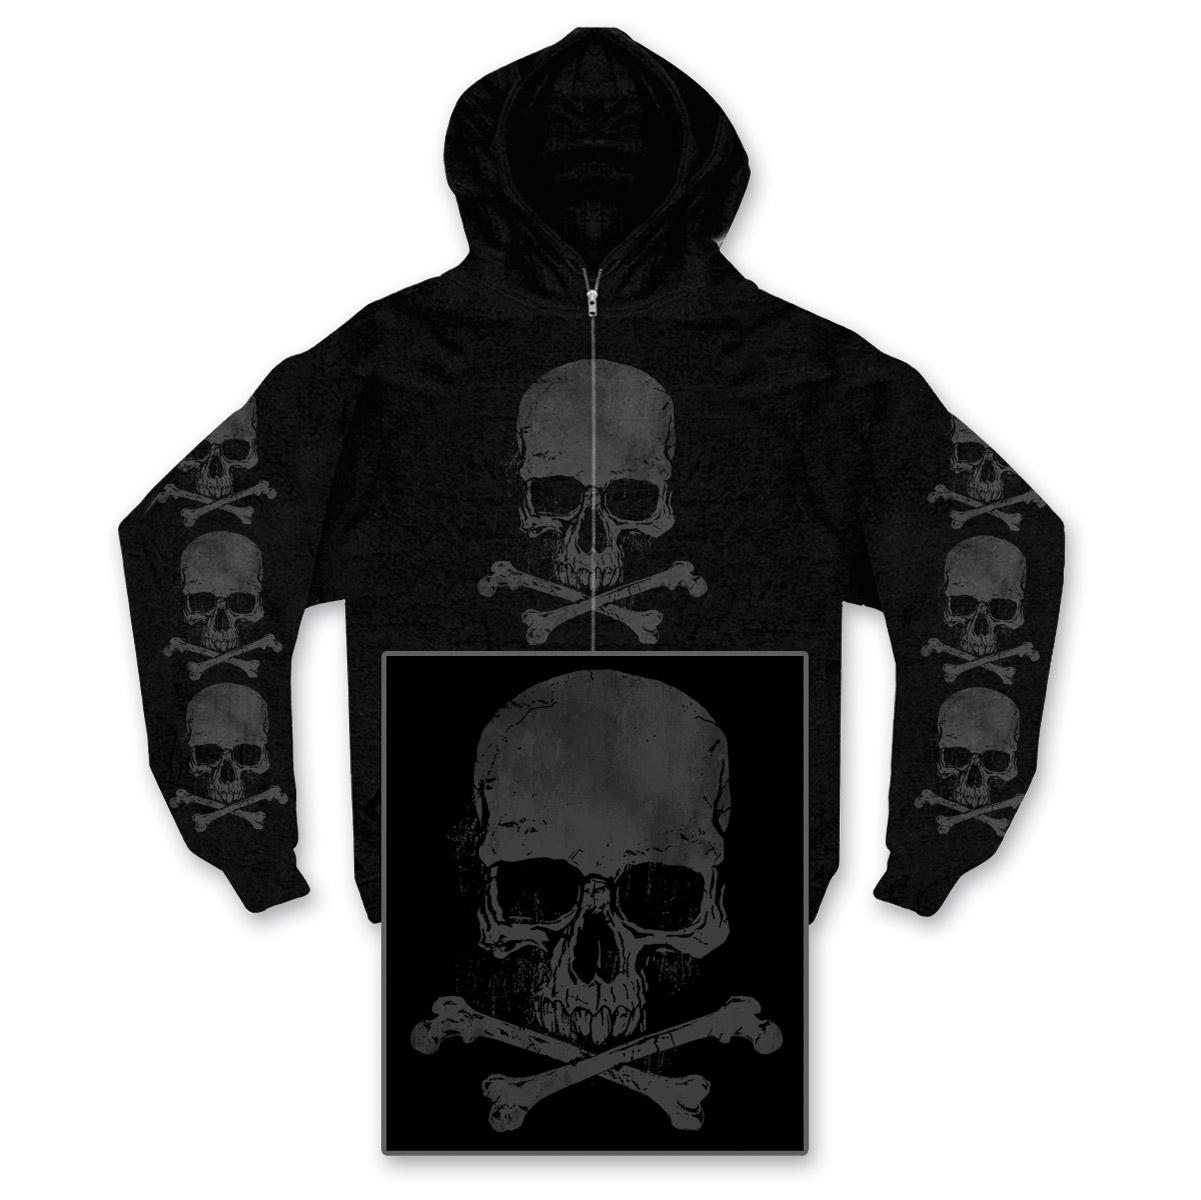 Hot Leathers Skull and Crossbones Men's Black Full Zip Hoodie